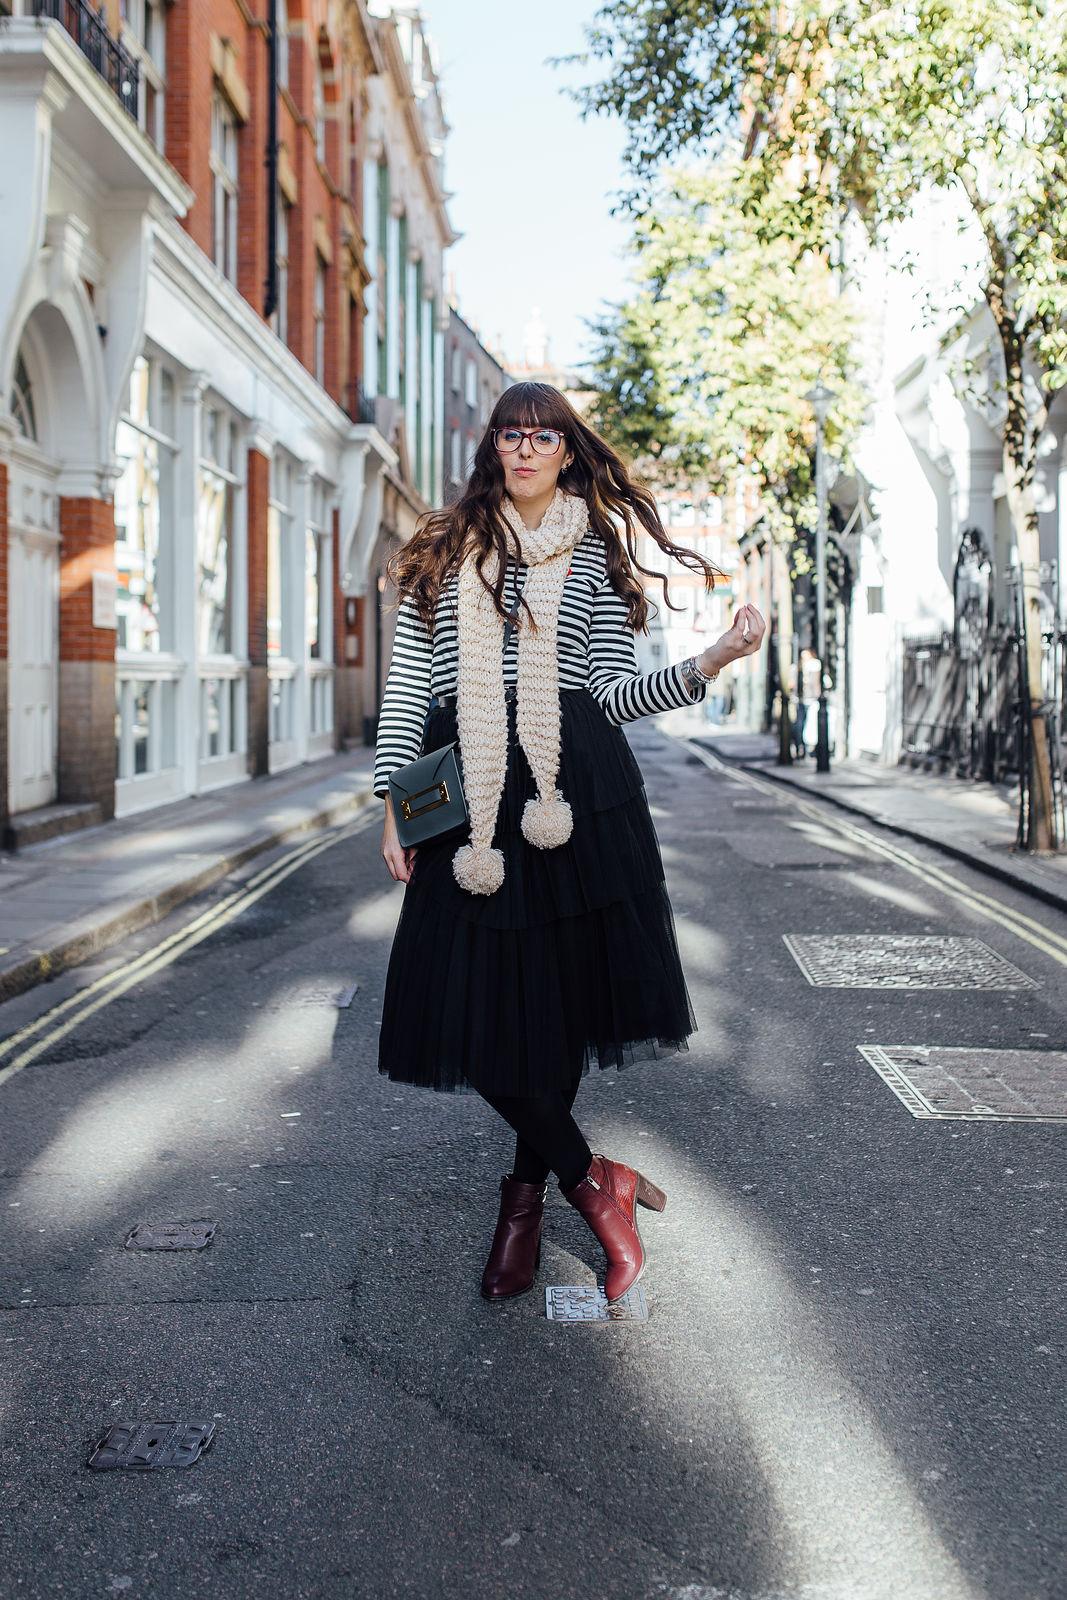 Danielle, Fashionistabarbieuk